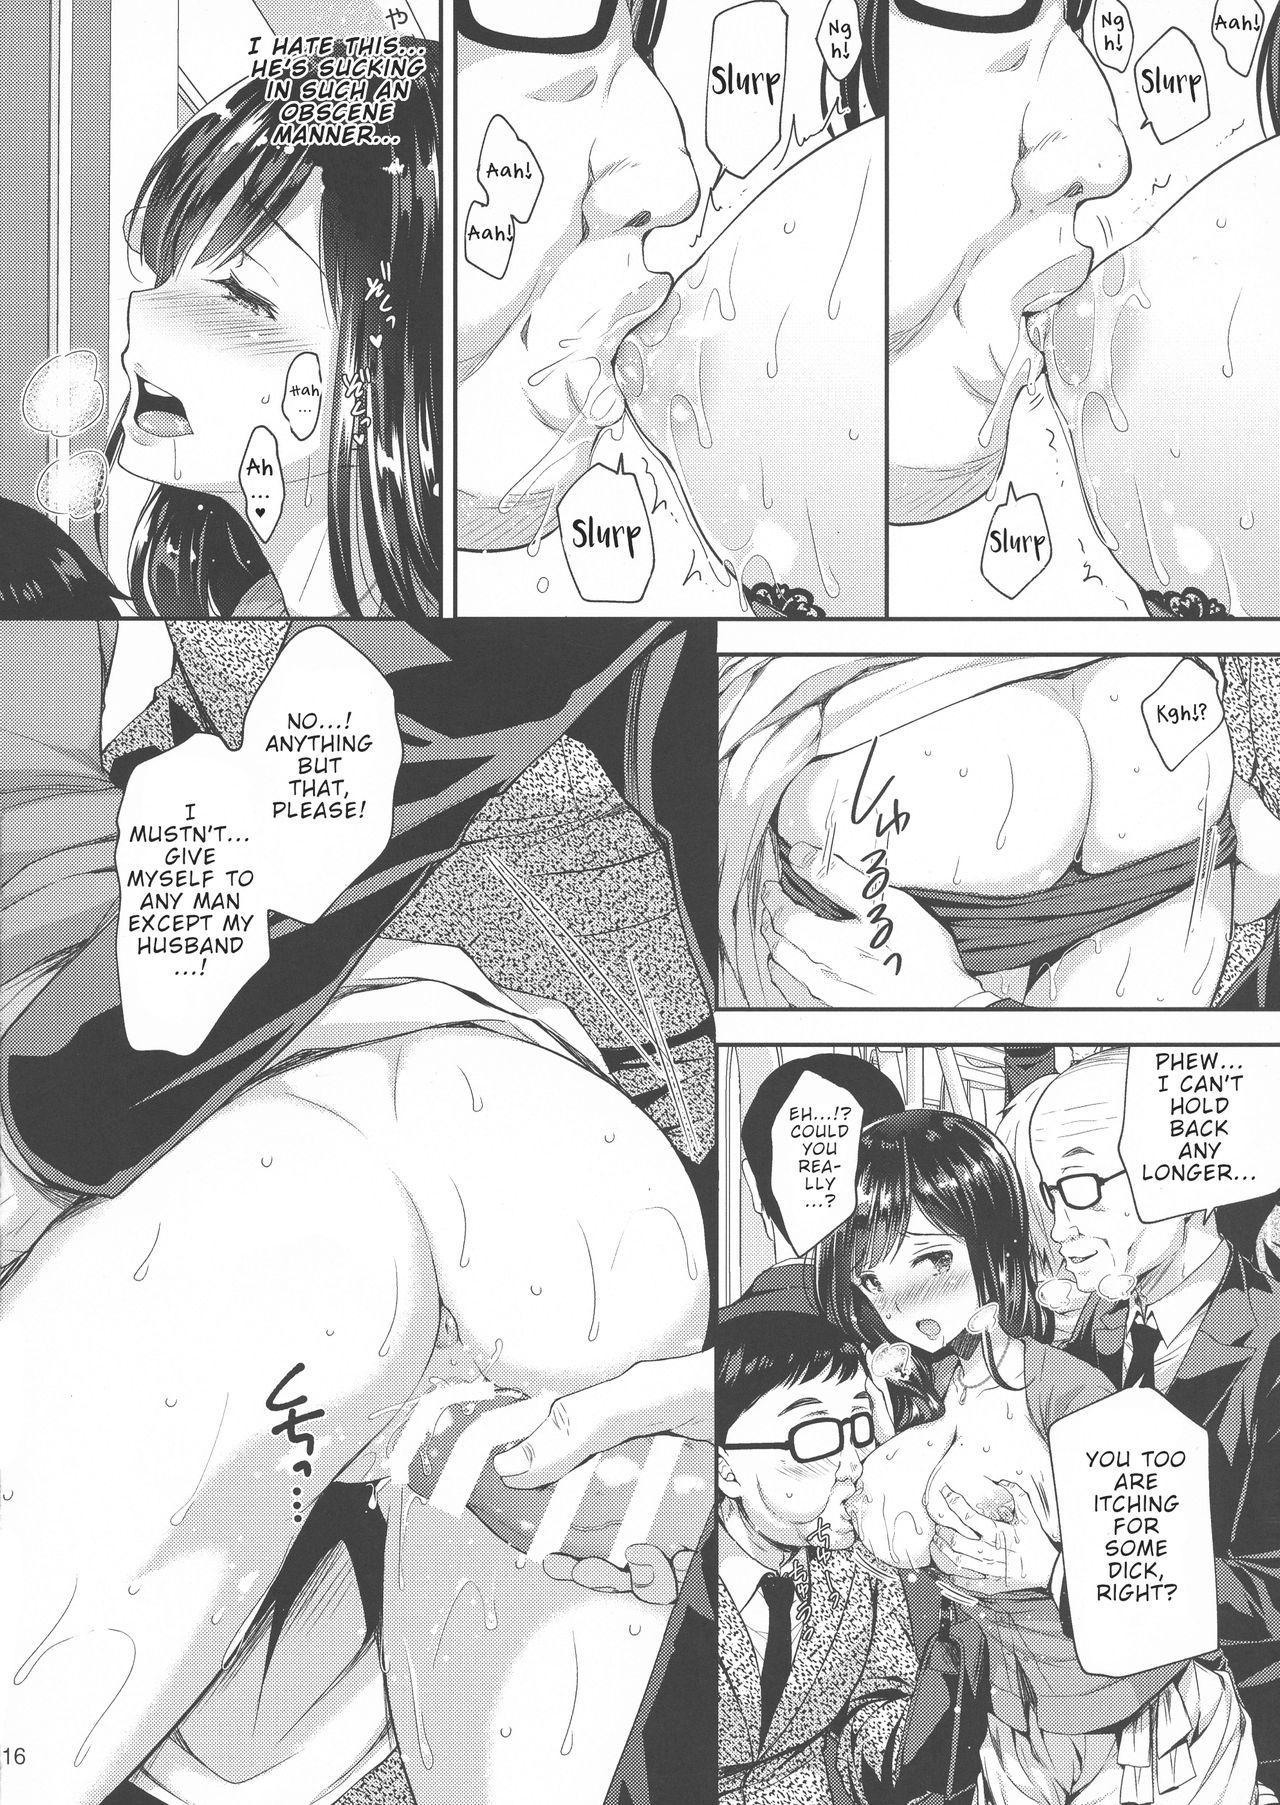 (C94) [Sugar*Berry*Syrup (Crowe)] Chijoku no Chikan Densha 3 ~ Hitozuma Shanai Kyousei Junyuu ~ | Shameless Train Molester 3 ~ Forcing a Married Woman to Breastfeed in the Train ~ [English] [The Chrysanthemum Translations] 15